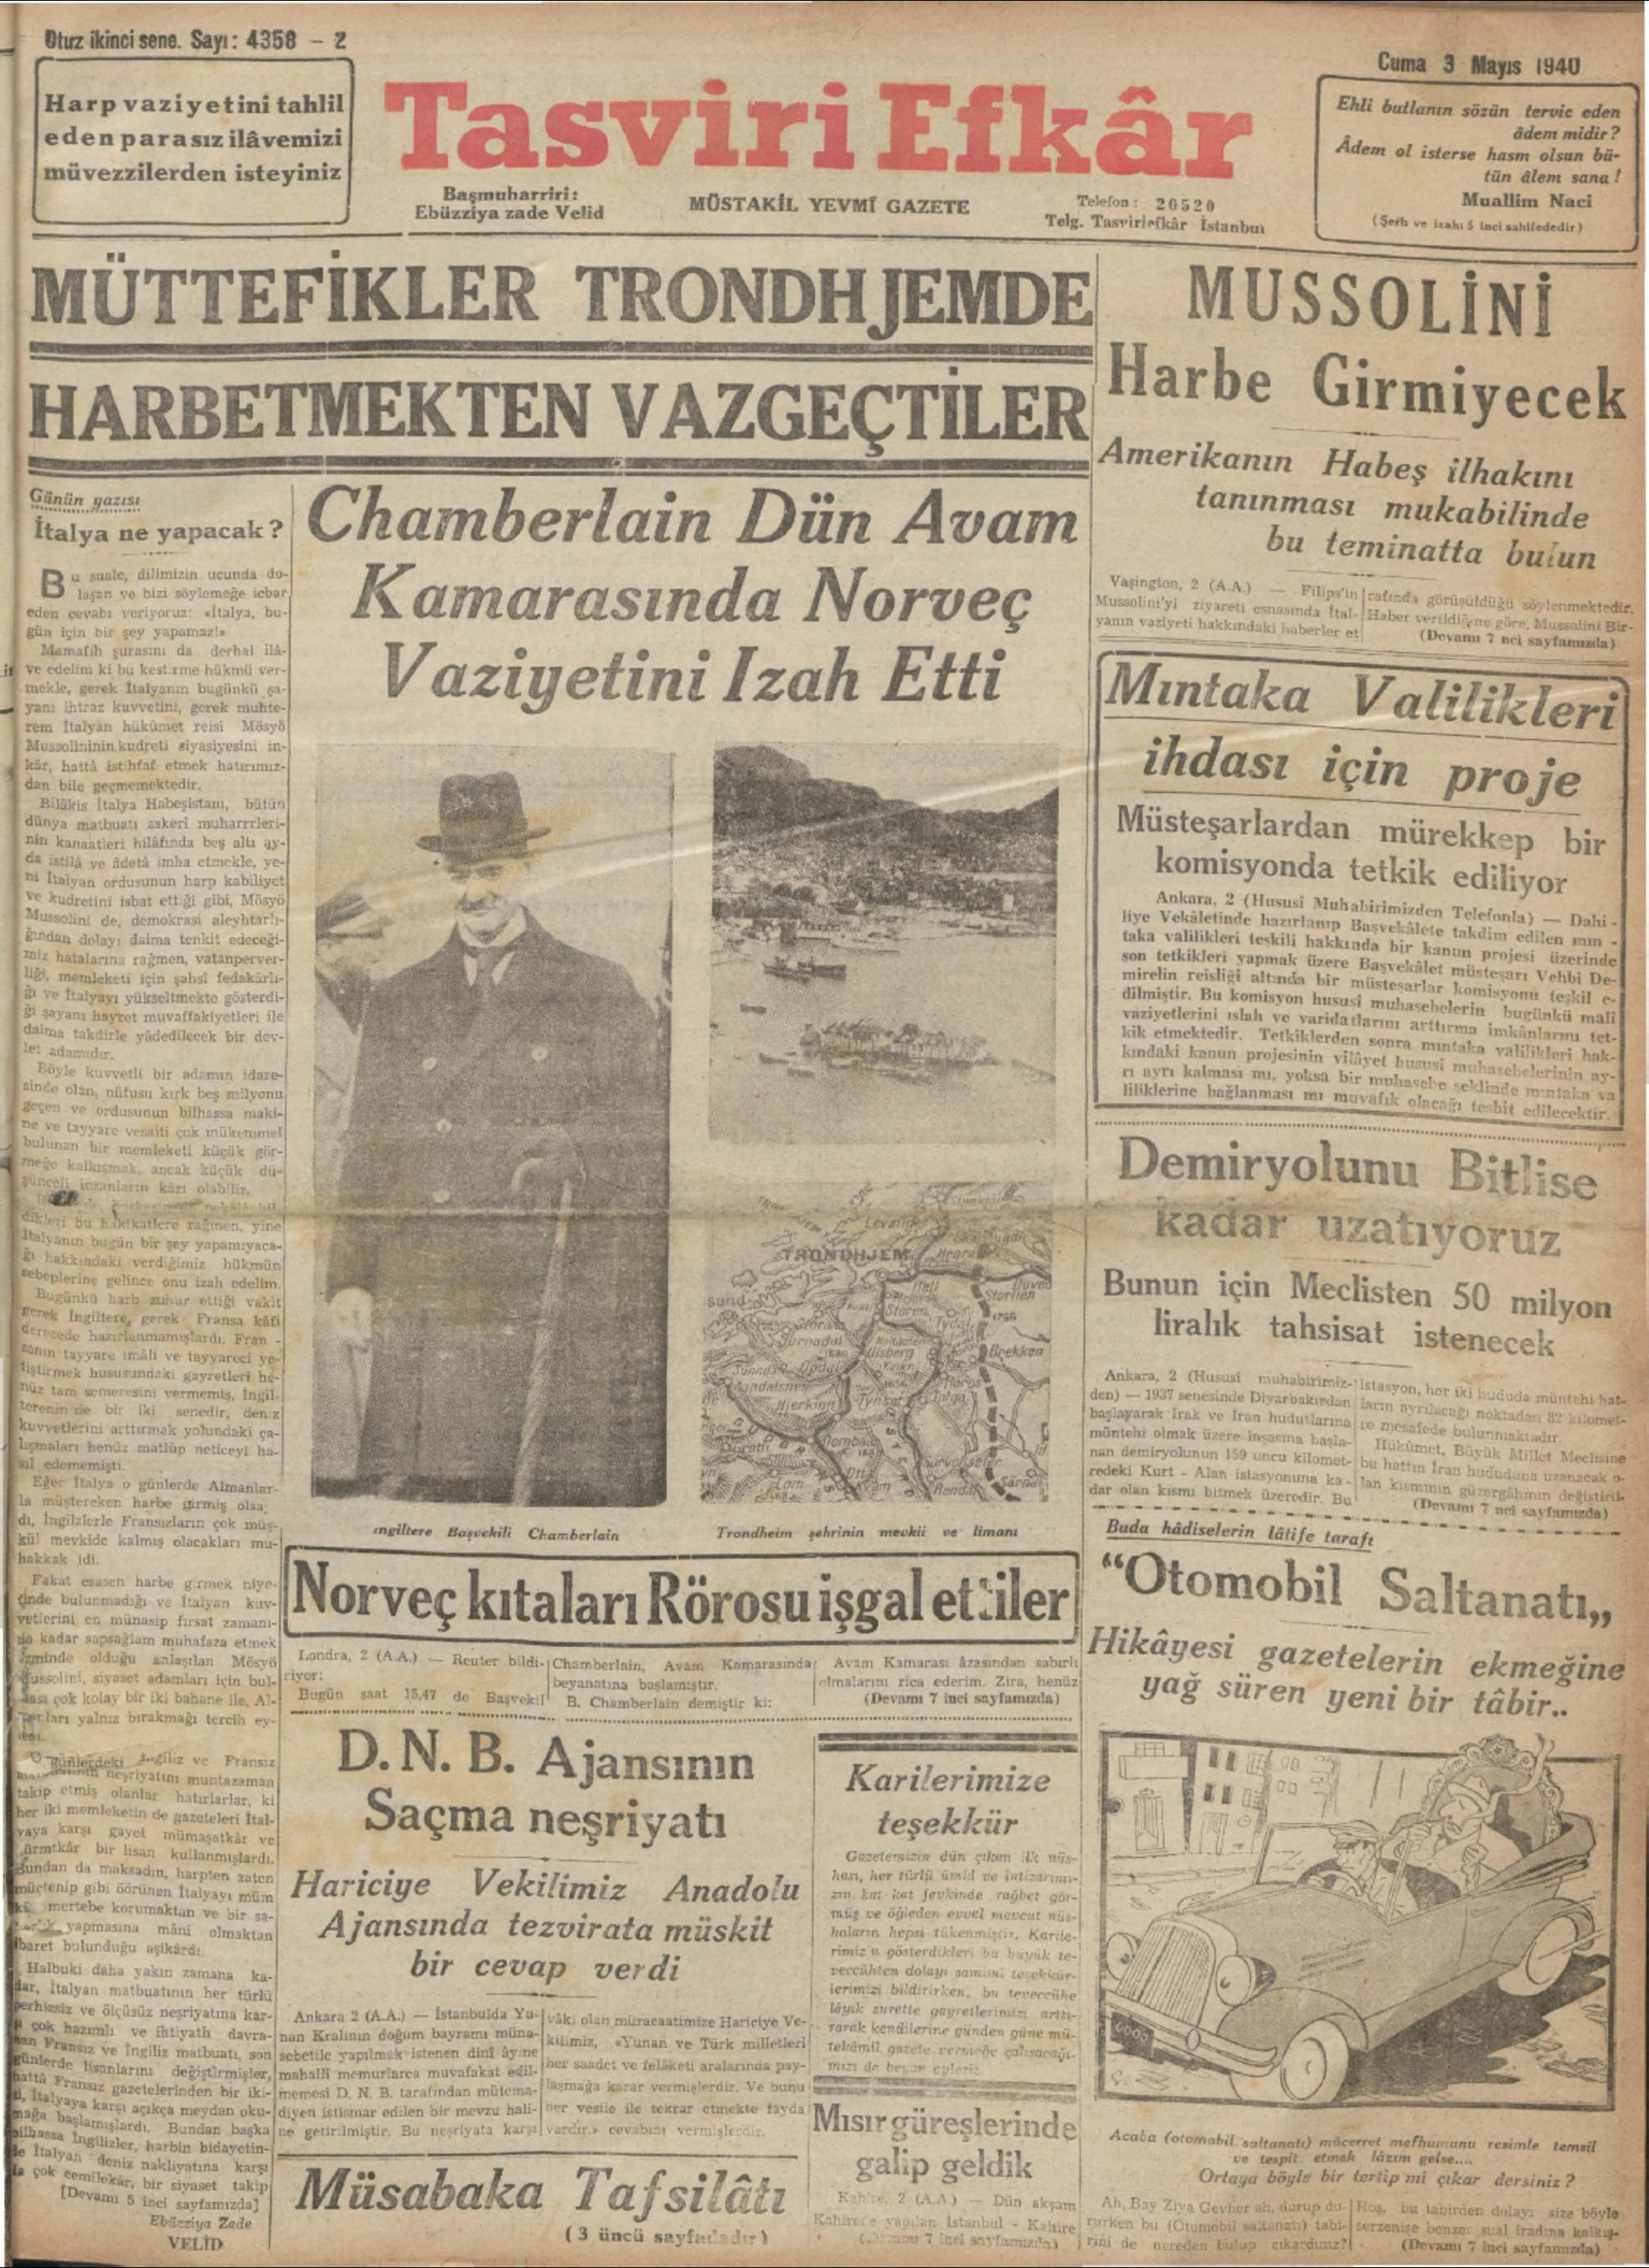 3 Mayıs 1940 Tarihli Tasviri Efkar Gazetesi Sayfa 1